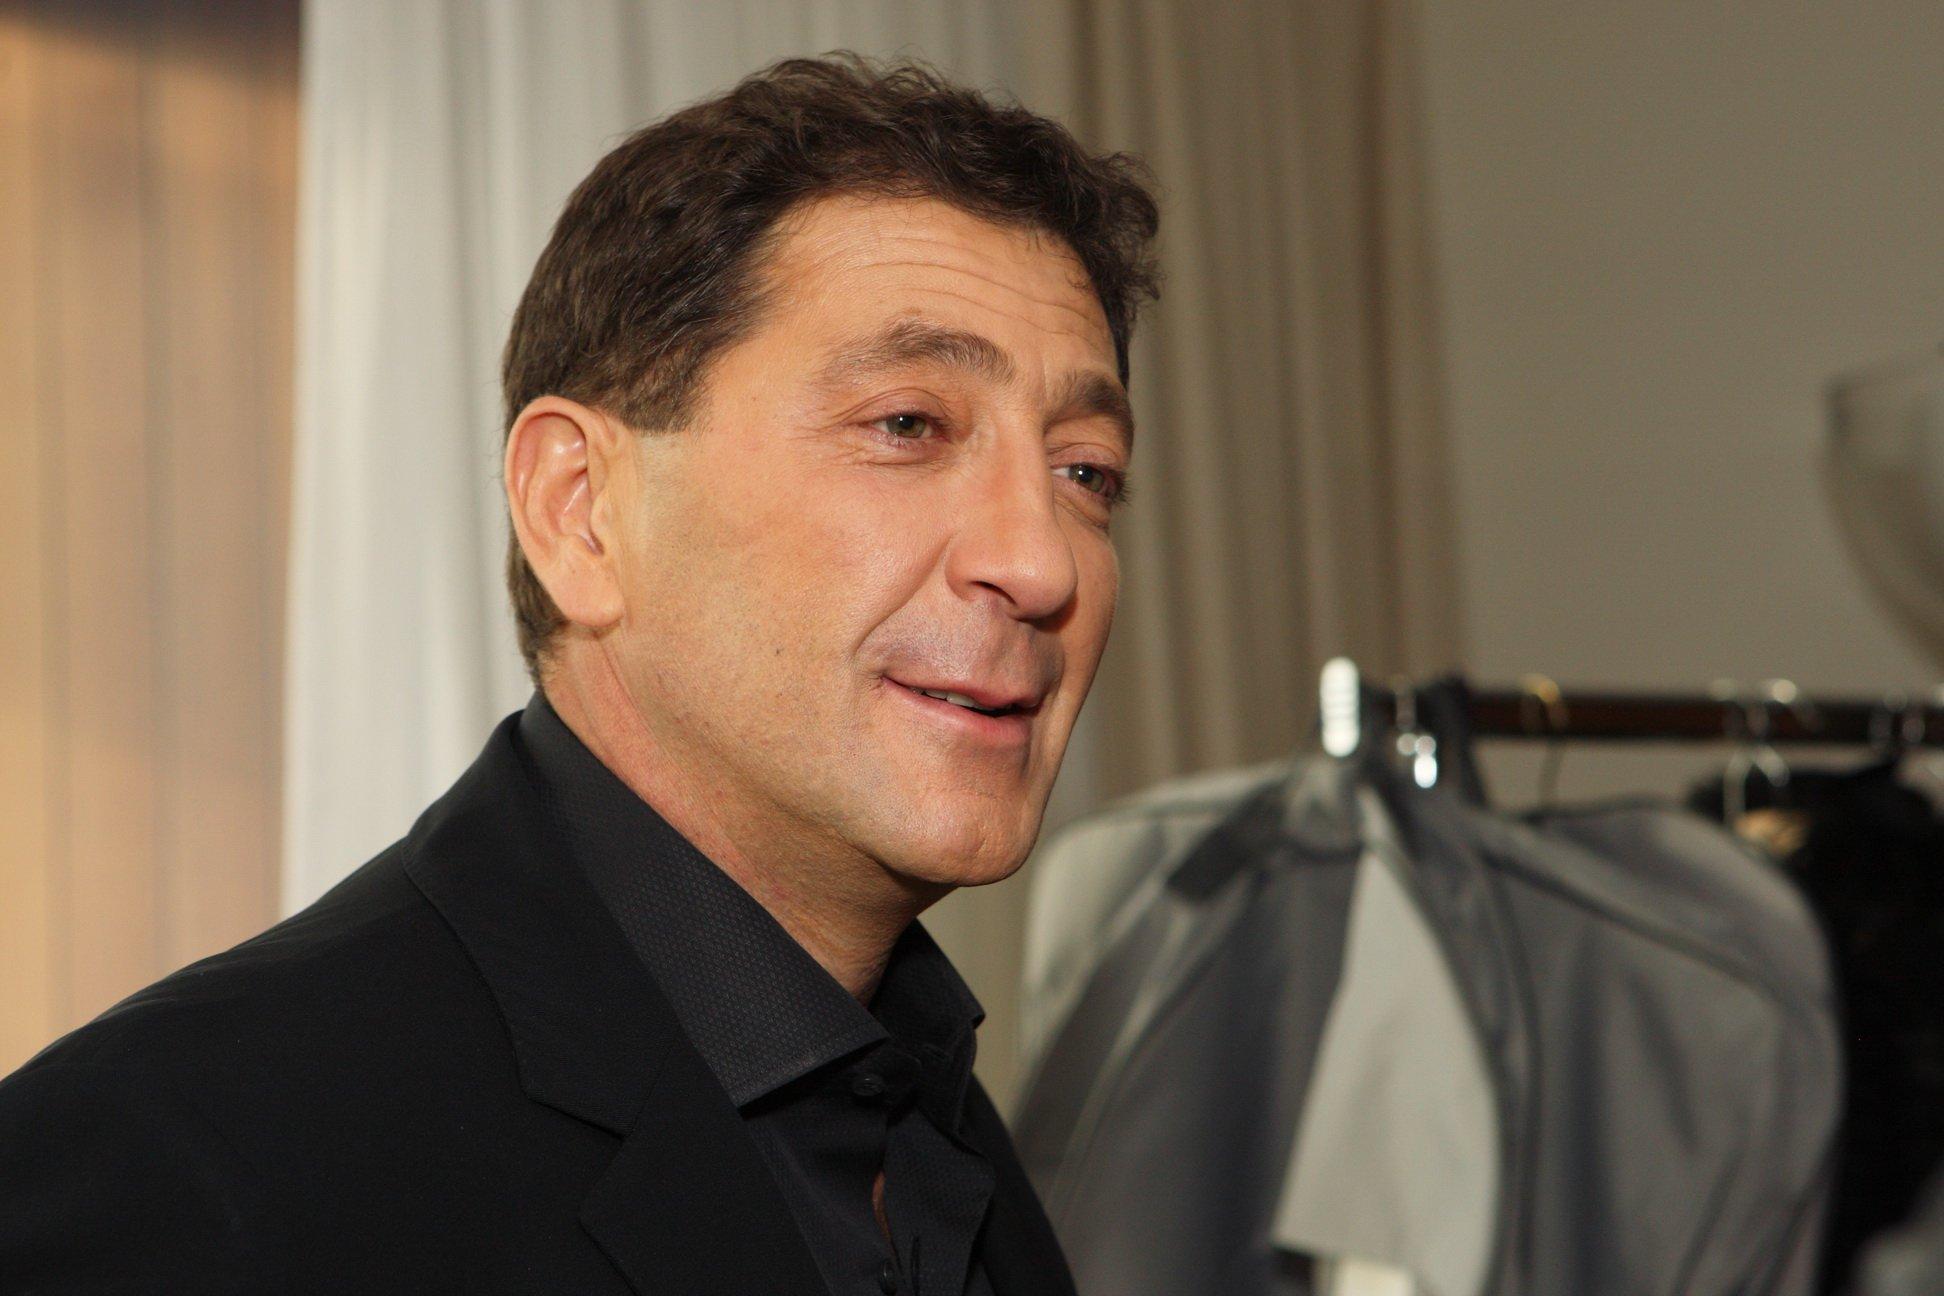 Григорий Лепс реализовал виллу вТаиланде заполтора млн долларов